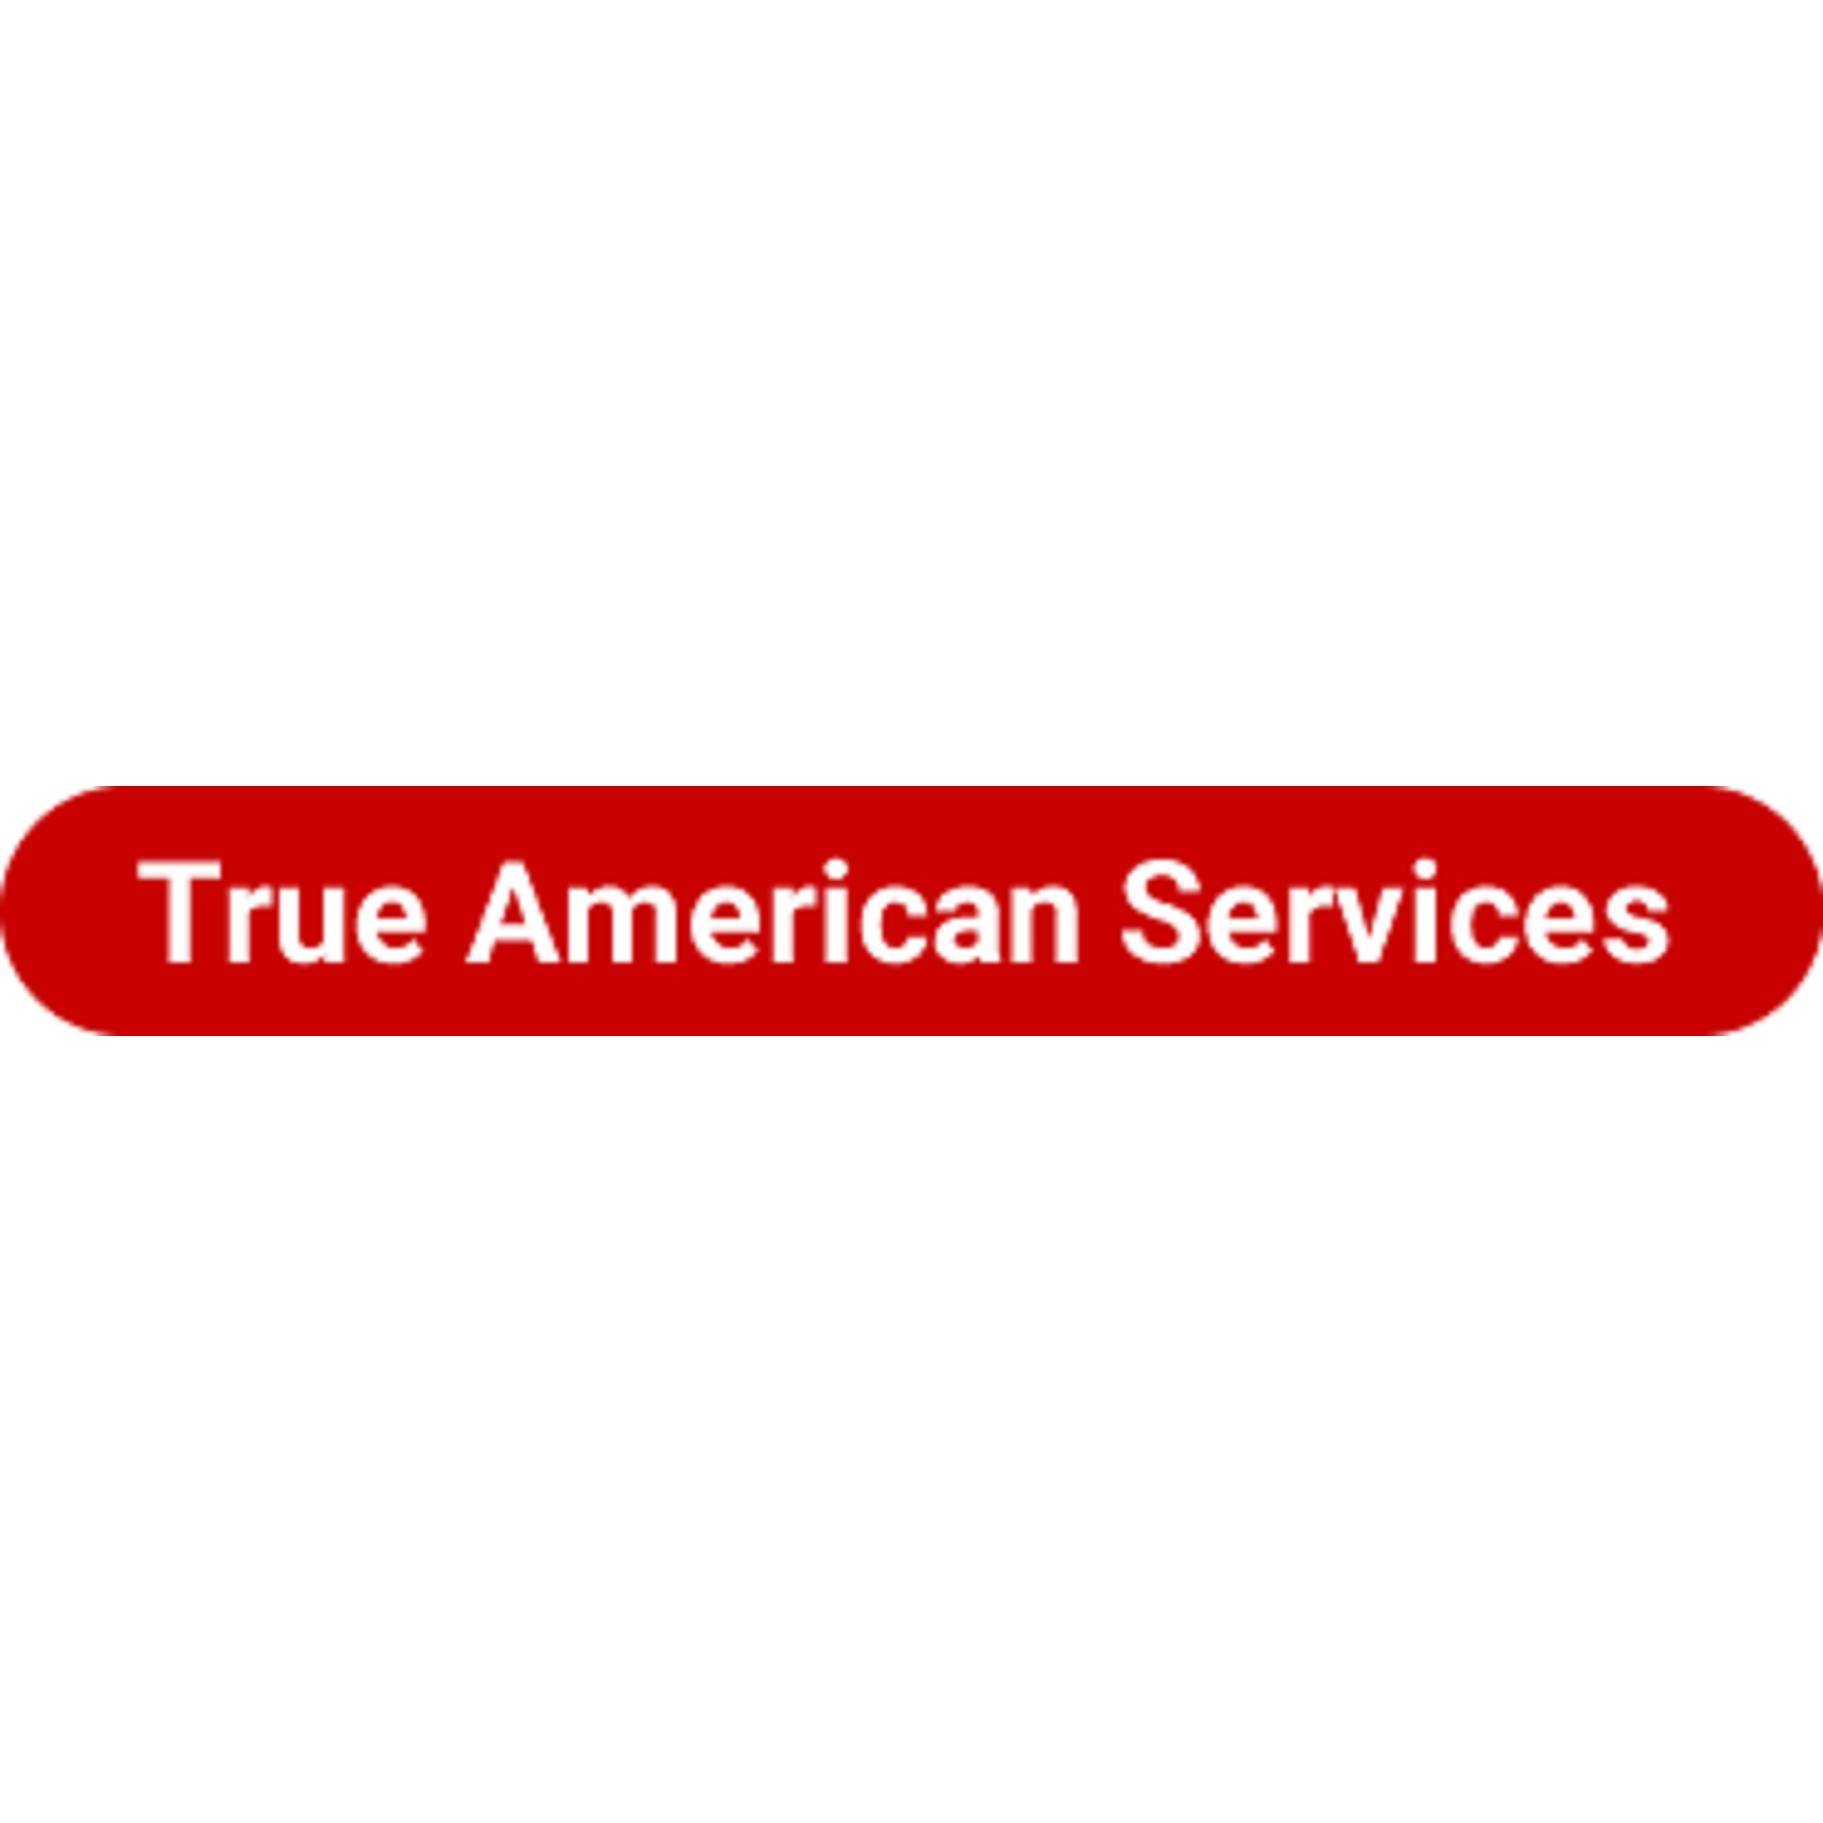 True American Services